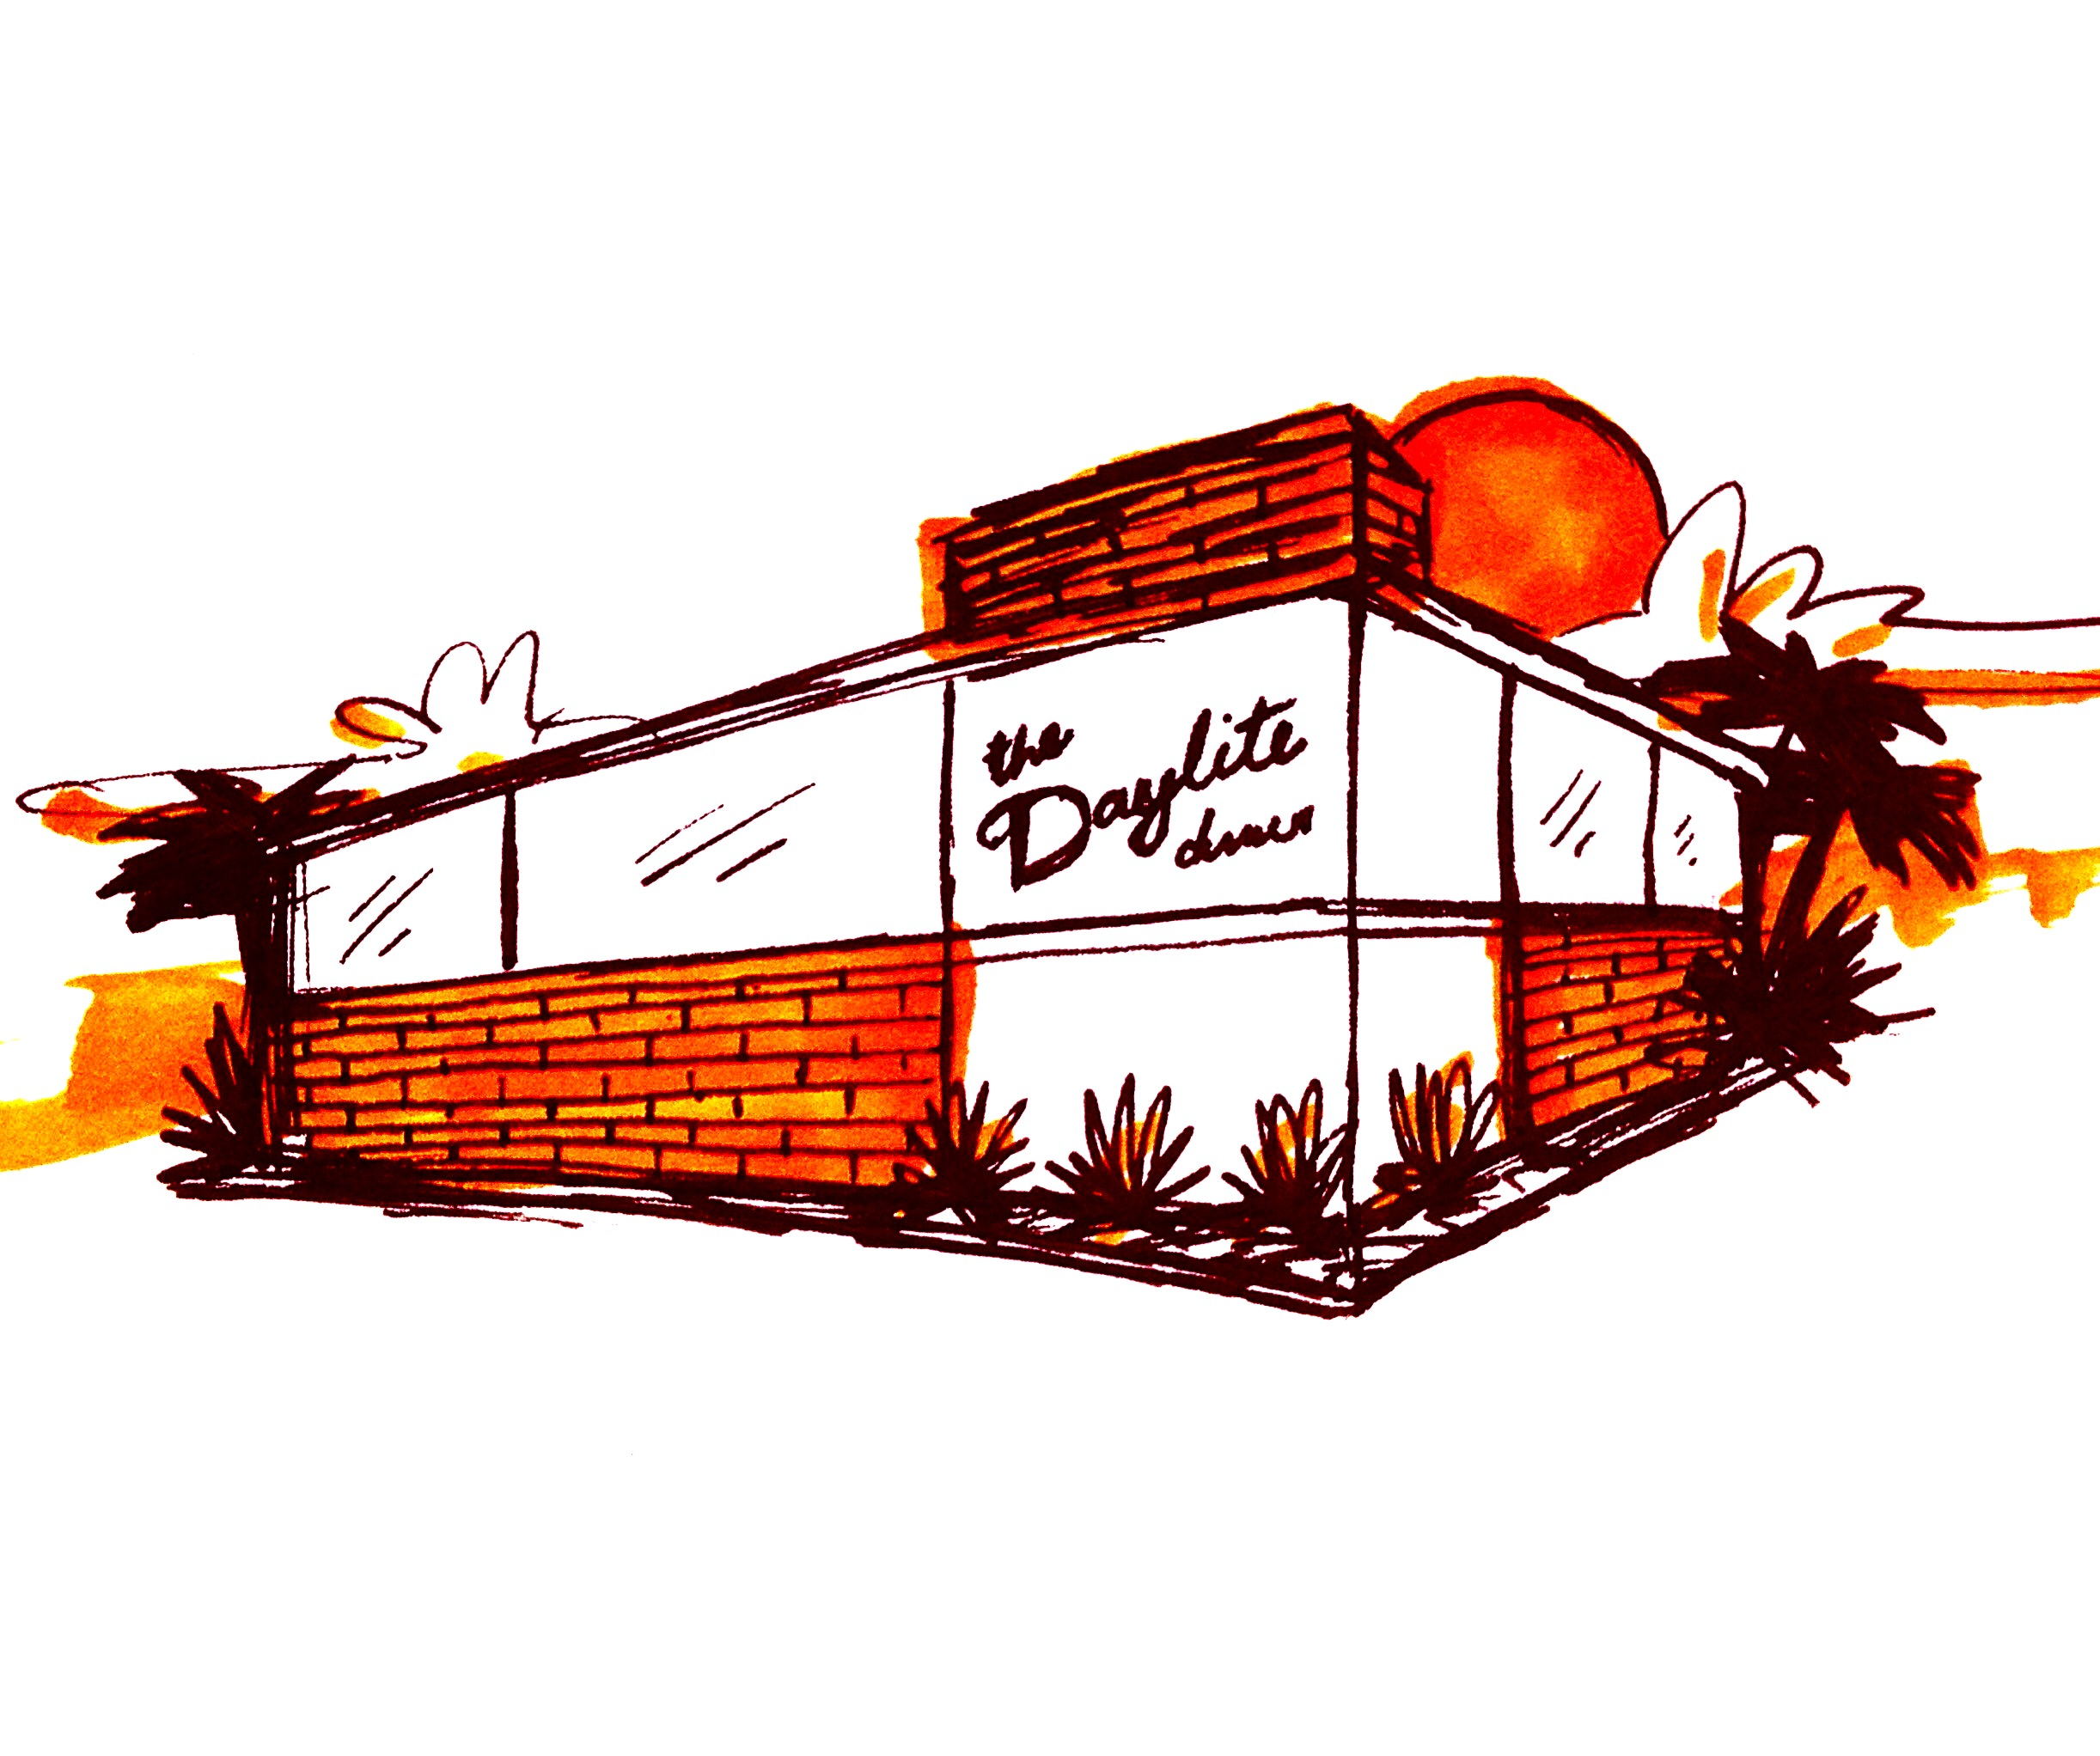 The Daylite Diner